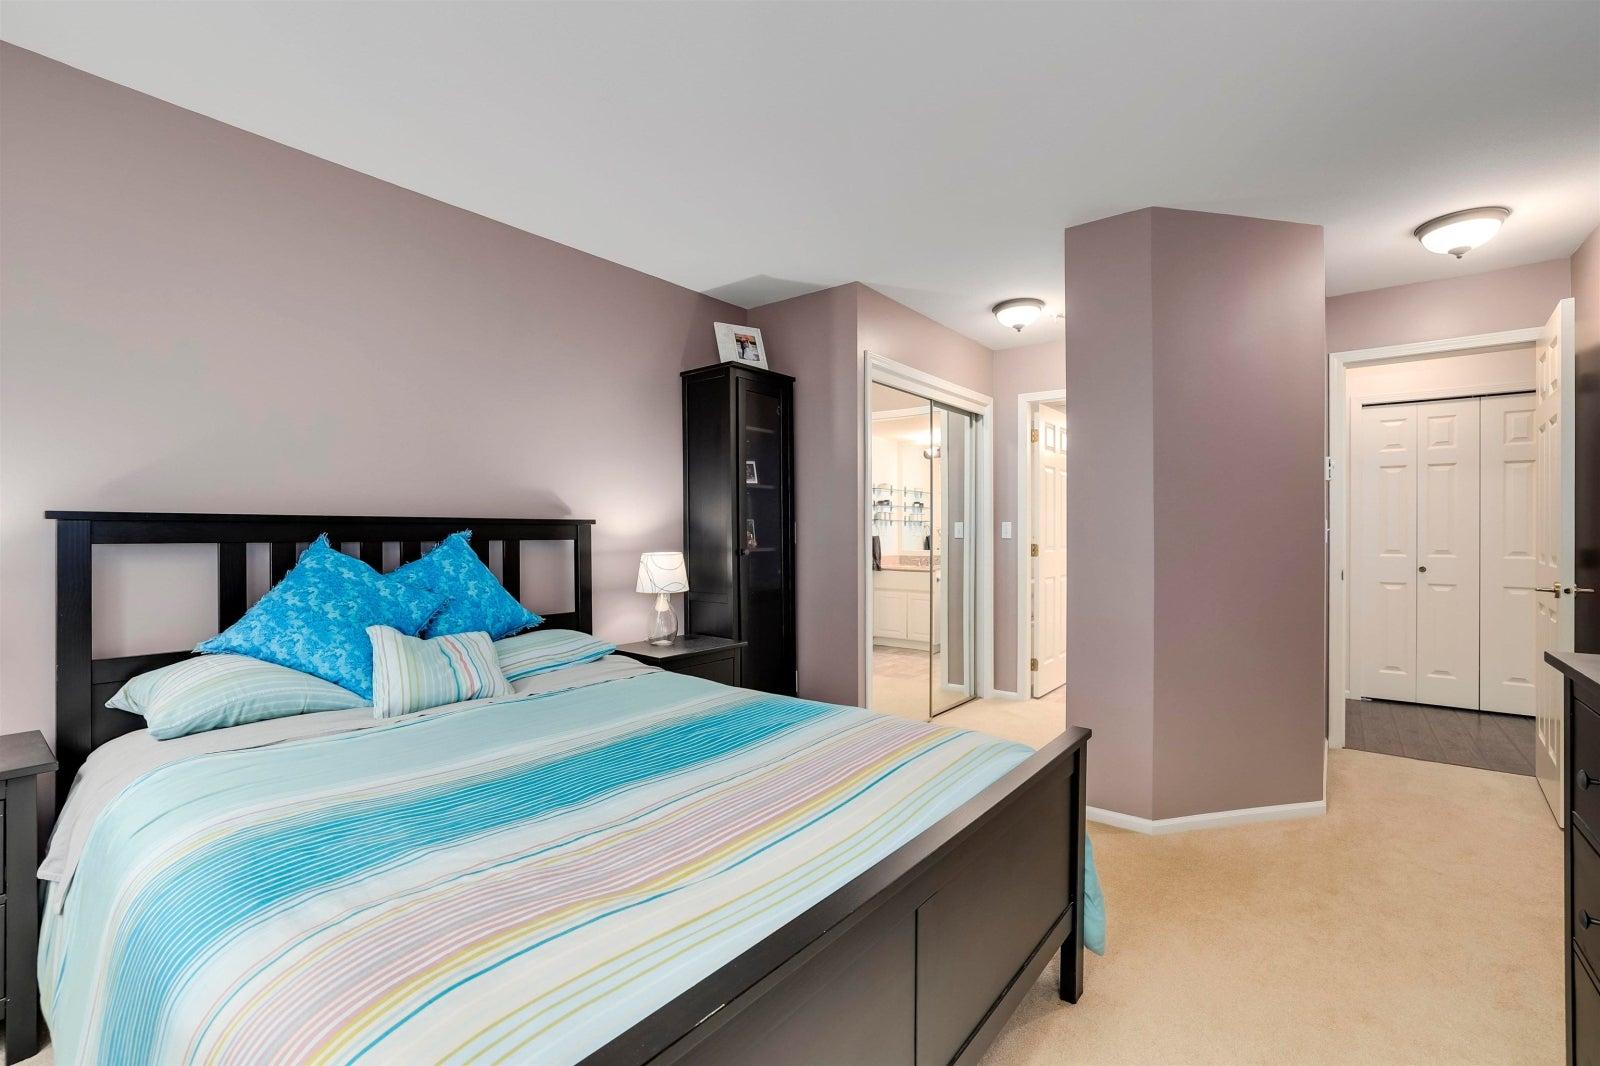 103 1132 DUFFERIN STREET - Eagle Ridge CQ Apartment/Condo for sale, 2 Bedrooms (R2618654) #17